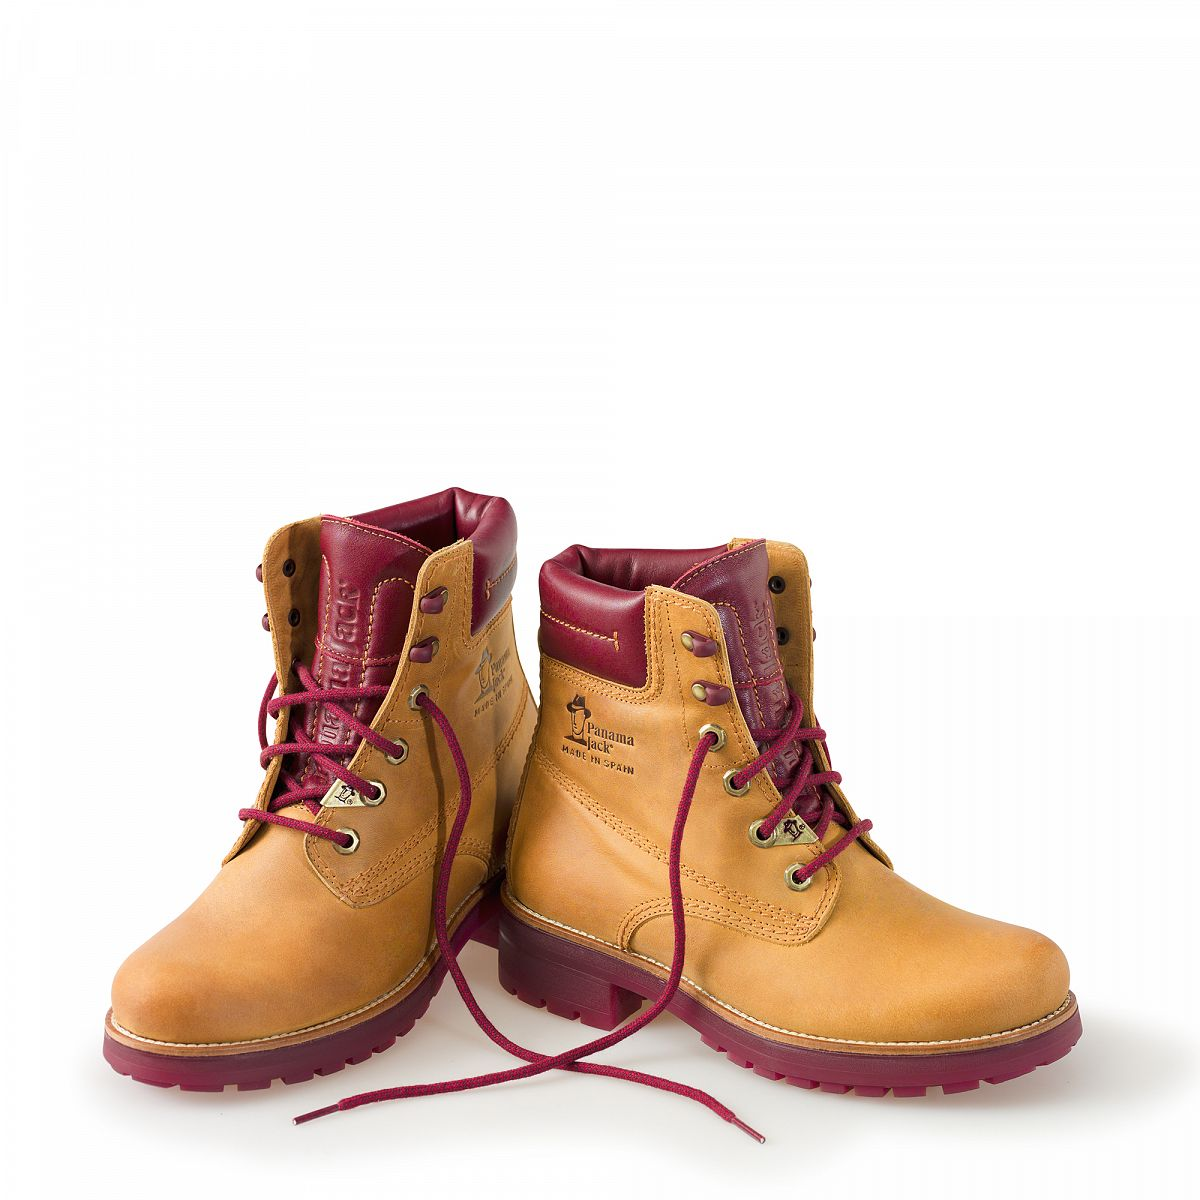 womens boots panama 03 limited vintage panama jack shop. Black Bedroom Furniture Sets. Home Design Ideas